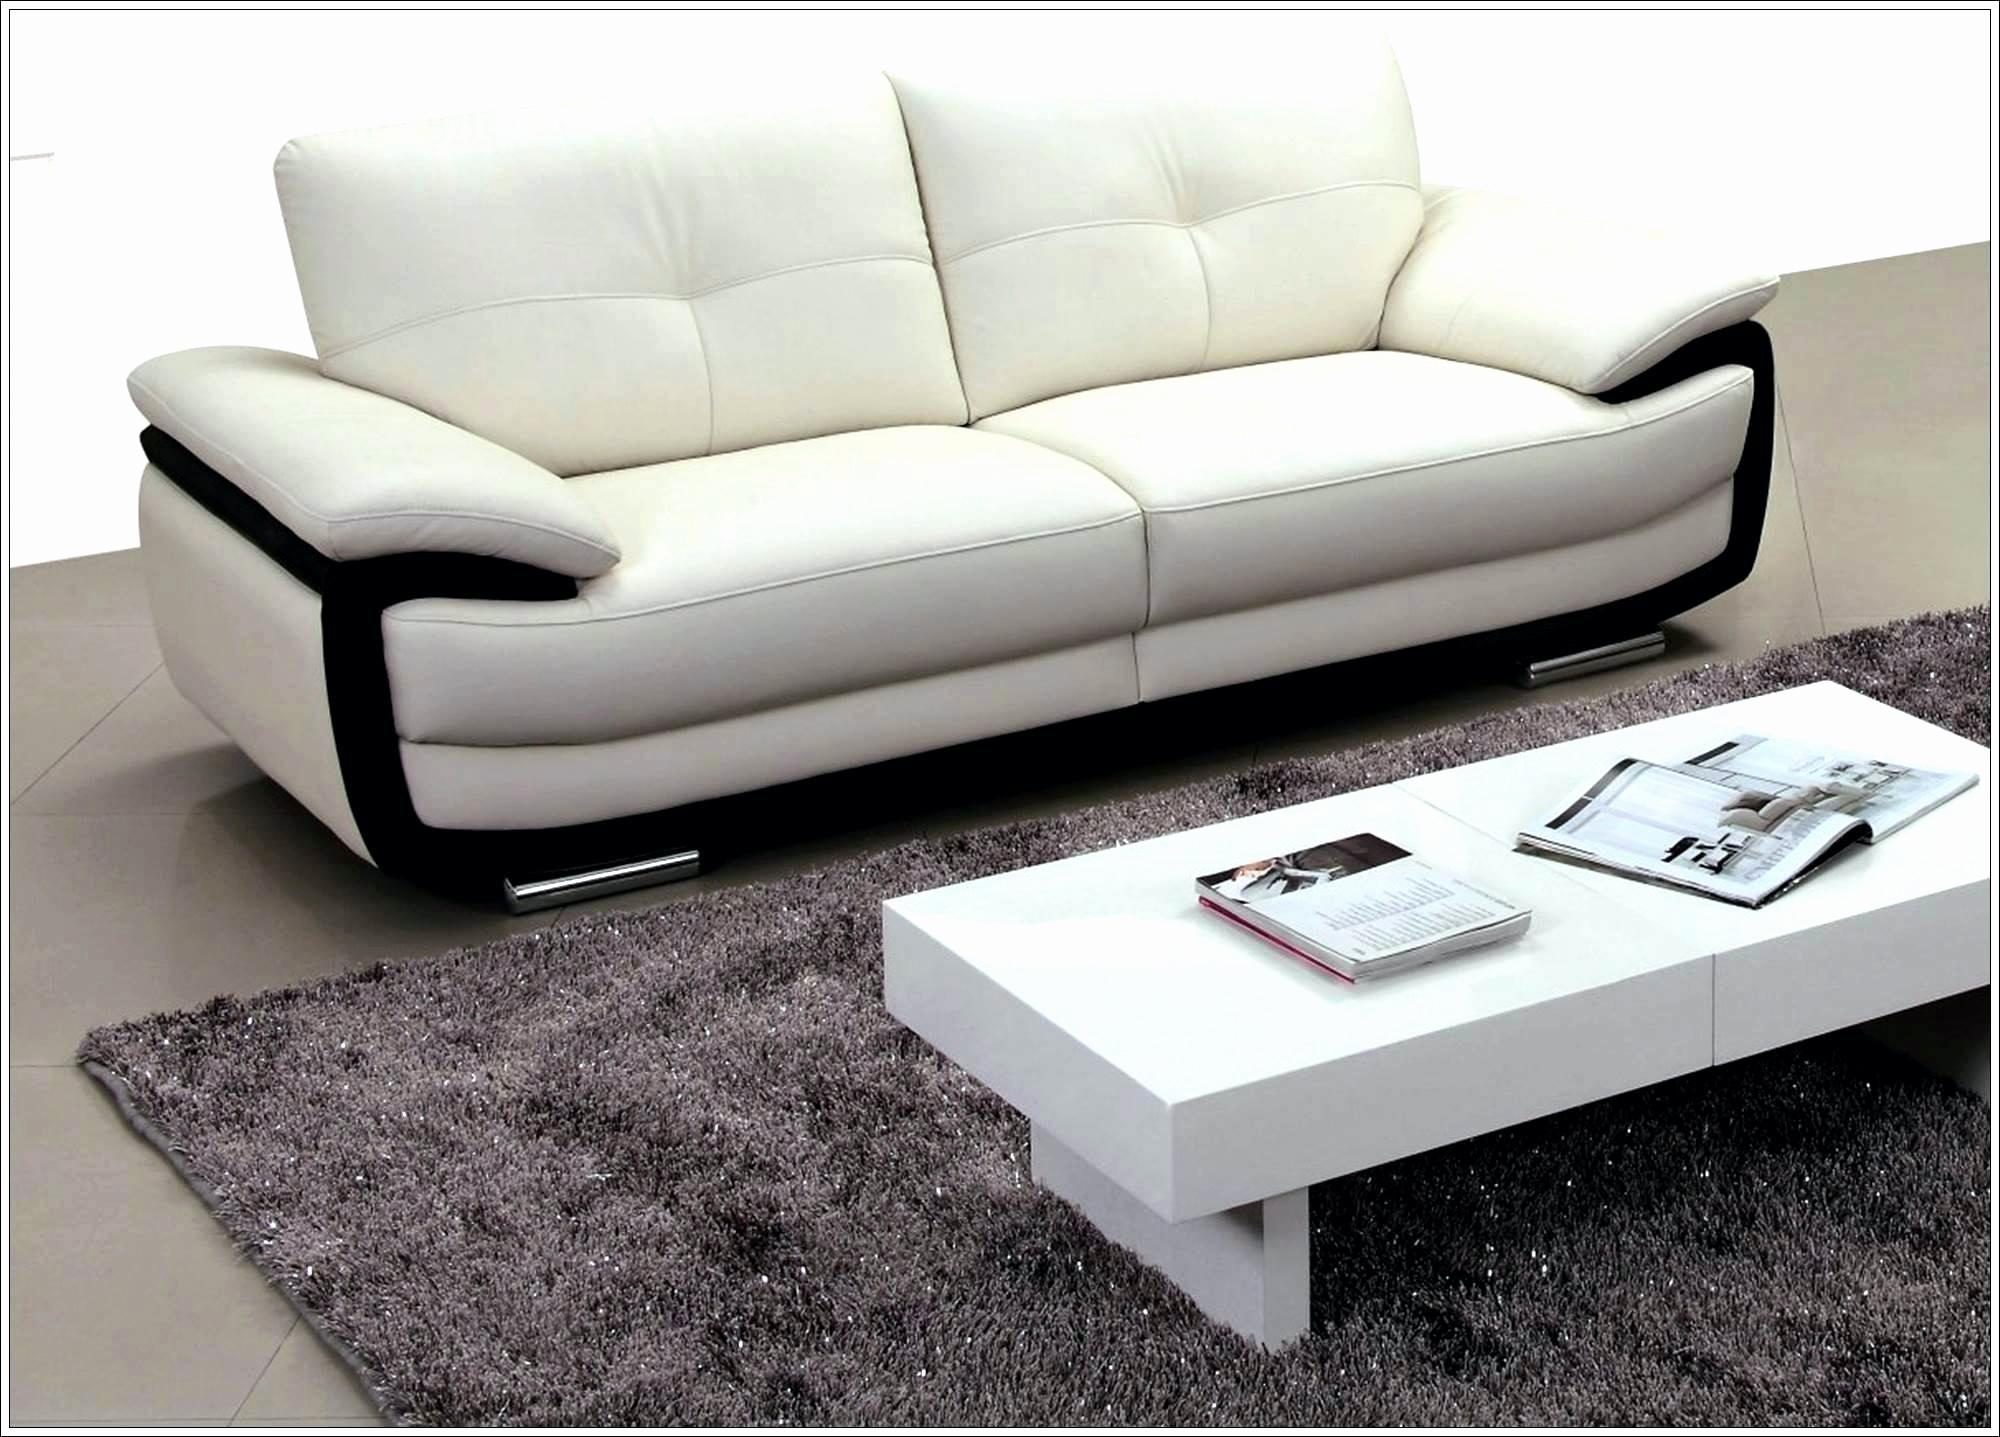 Canape Angle Cuir but Beau Image Salon Cuir Conforama Nouveau 15 Inspirant Canape Convertible but